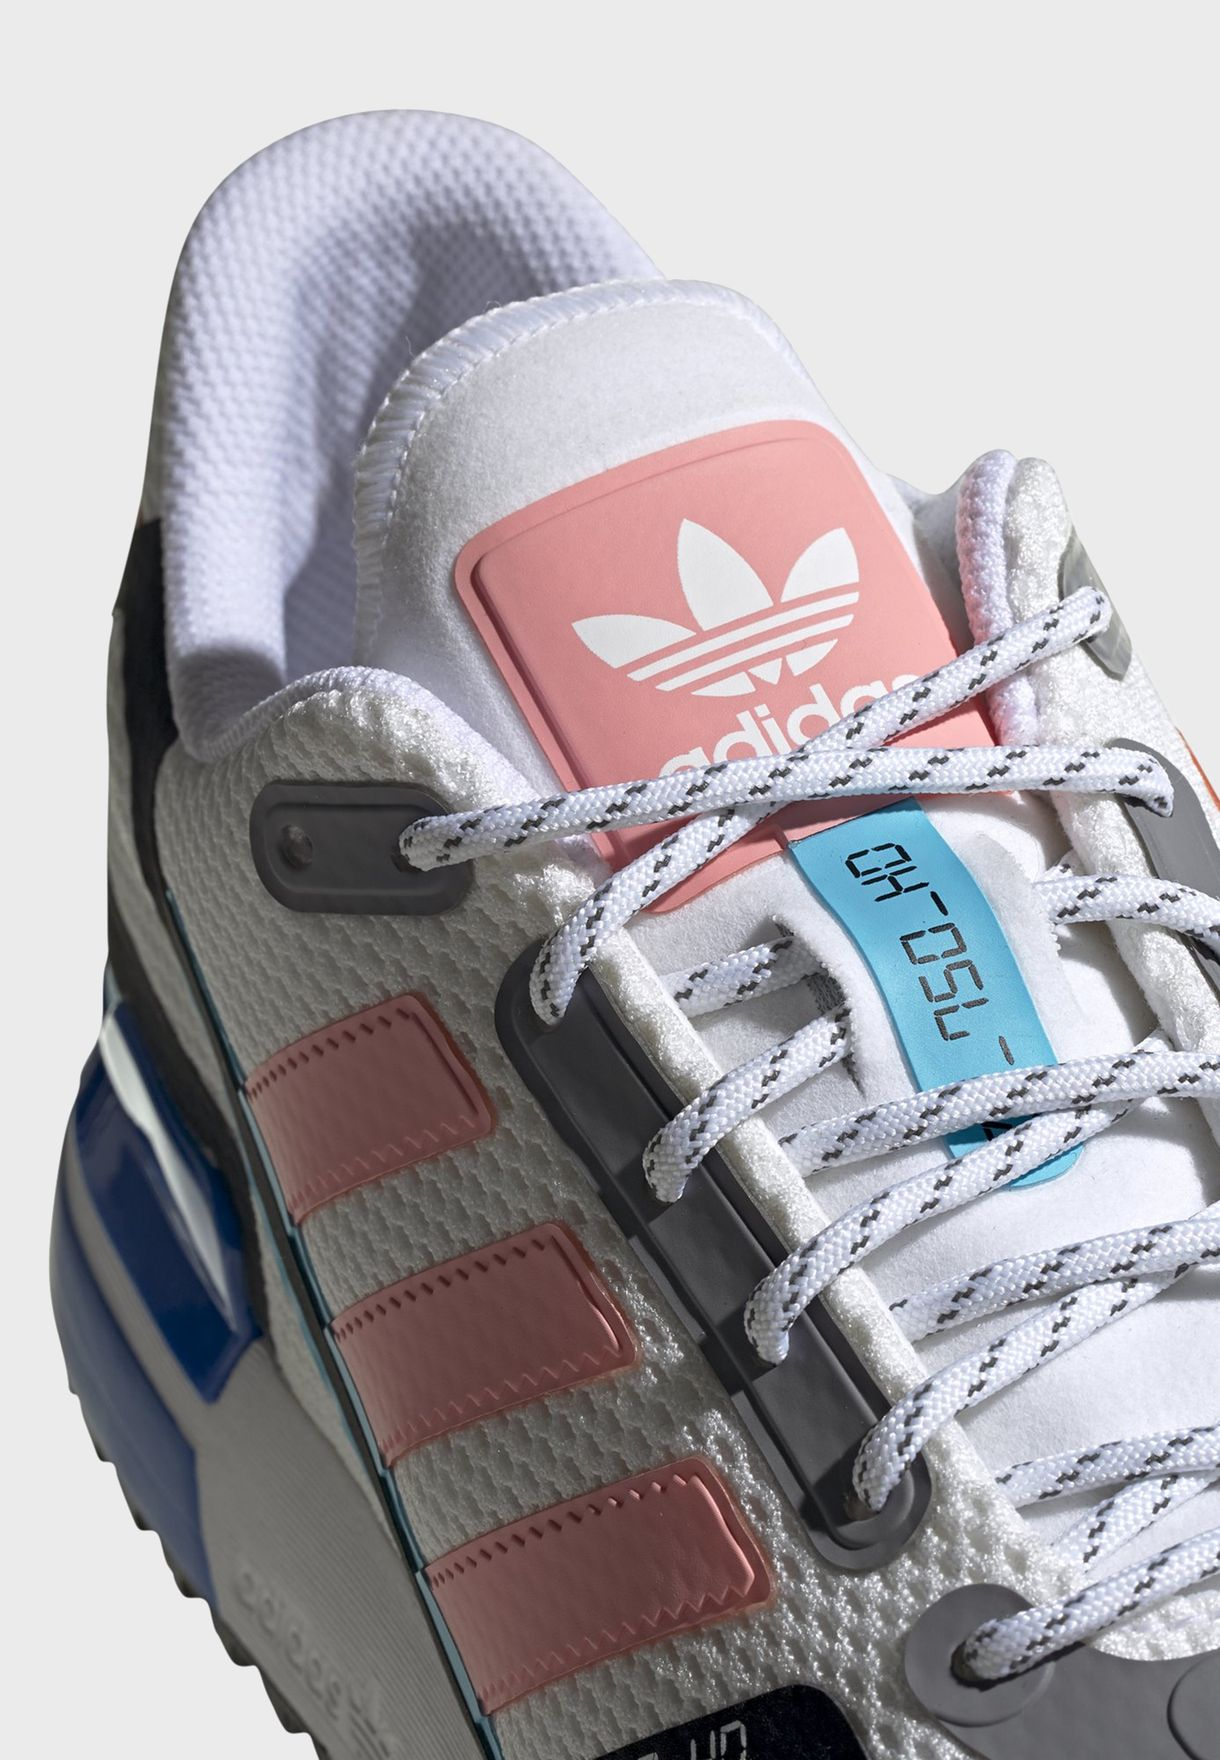 حذاء زد اكس 750 اتش دي